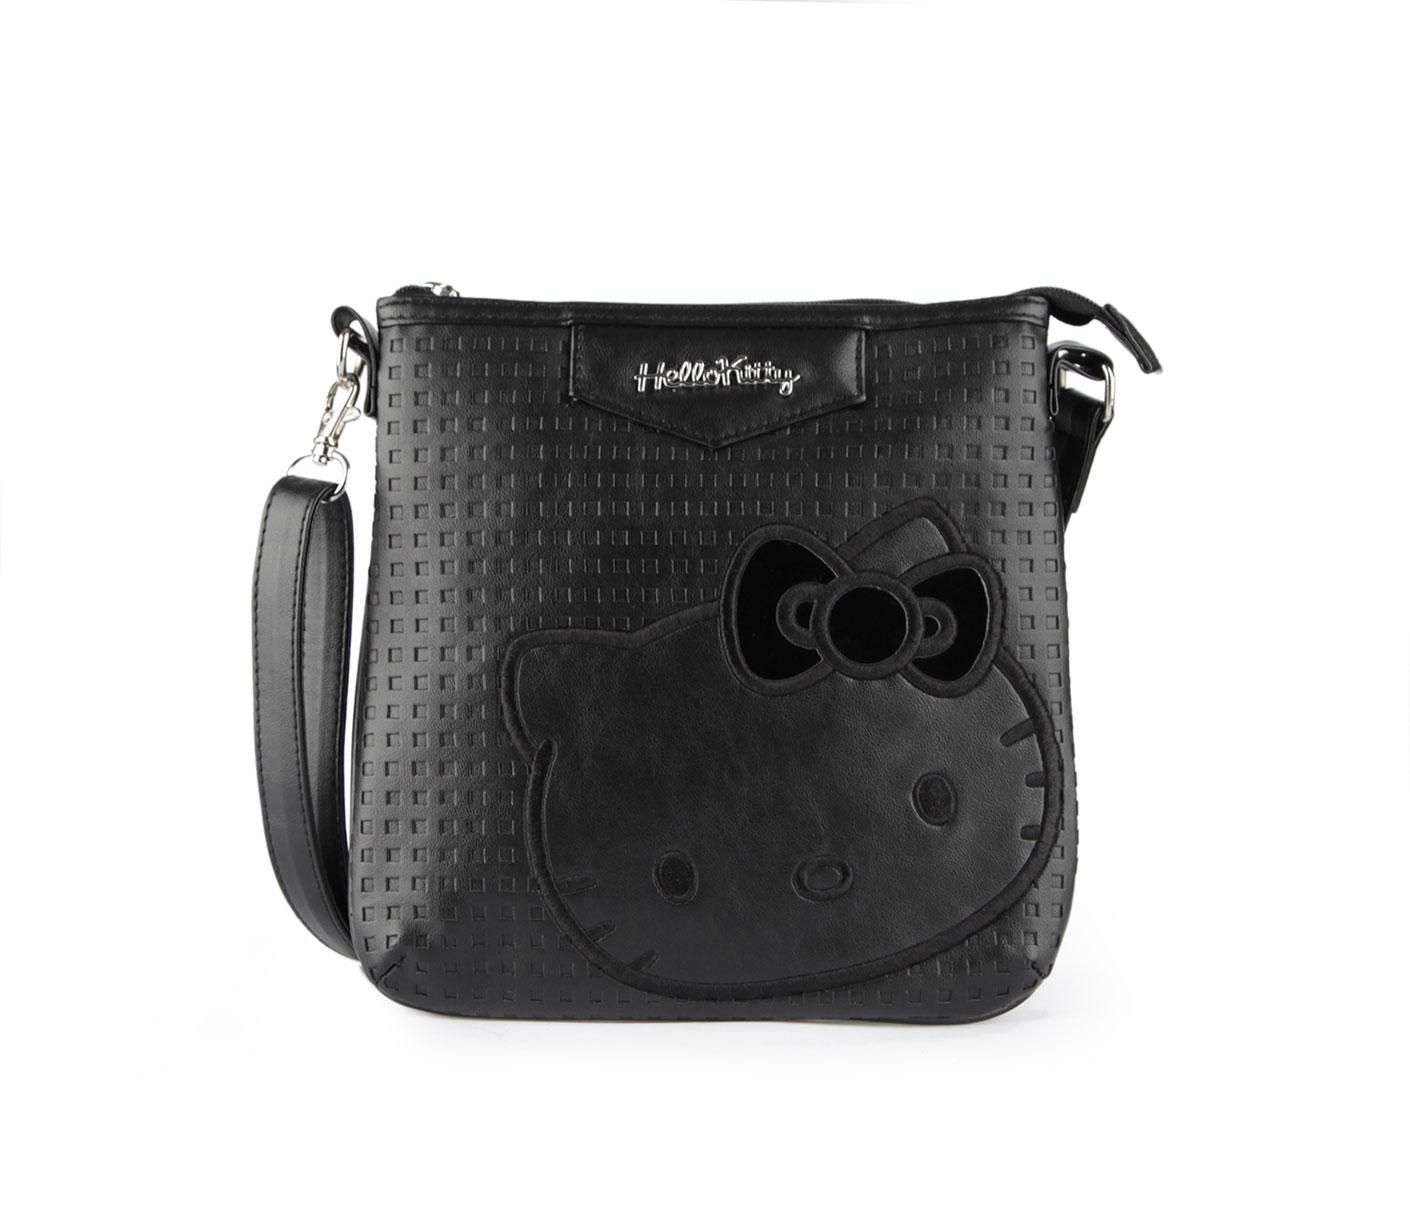 f60b3541d Hello Kitty Crossbody Bag: Midnight | Sanrio Bags | Hello kitty bag ...